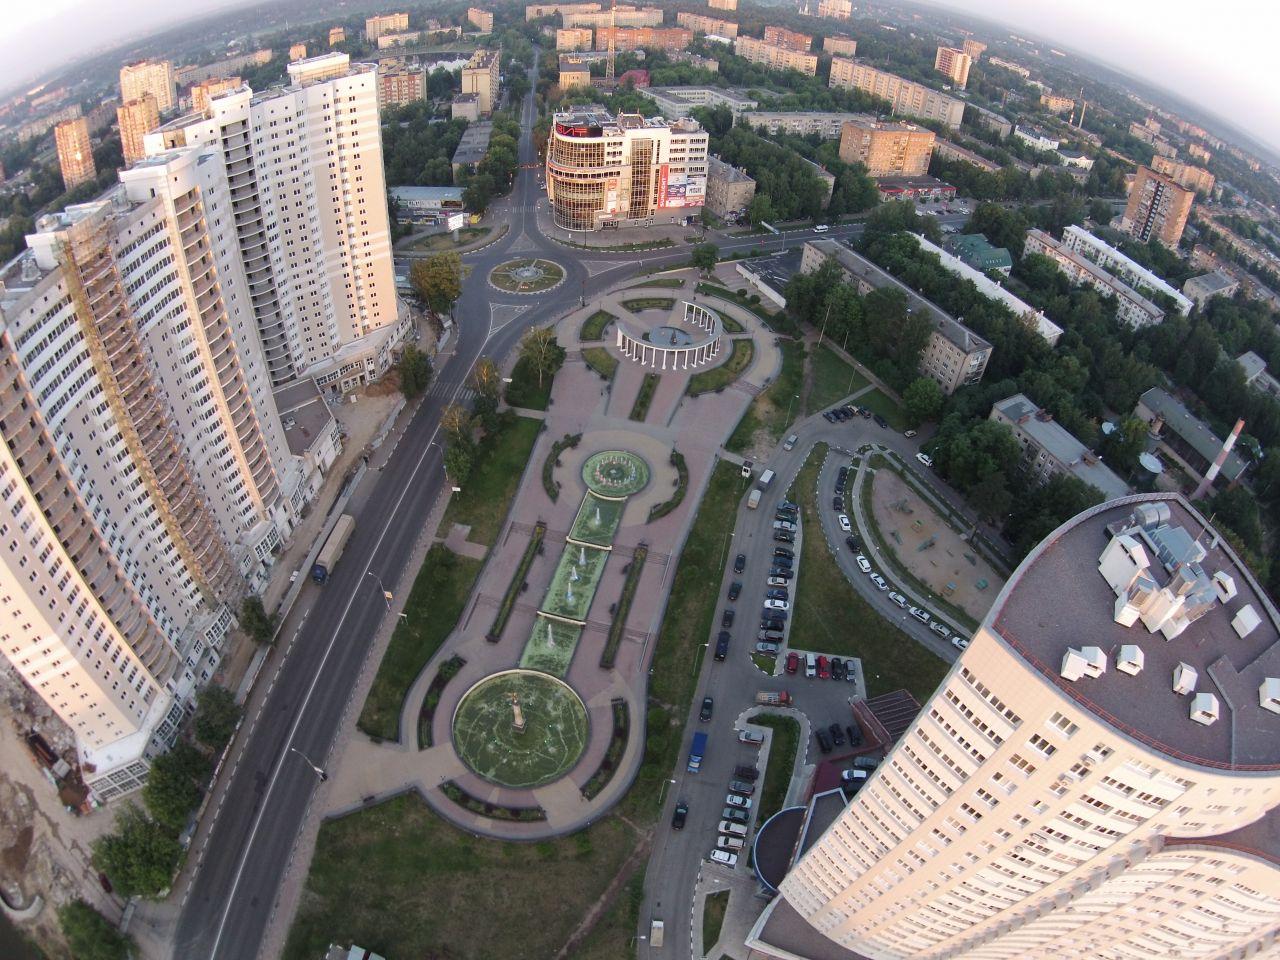 картинки г пушкино московской области словам